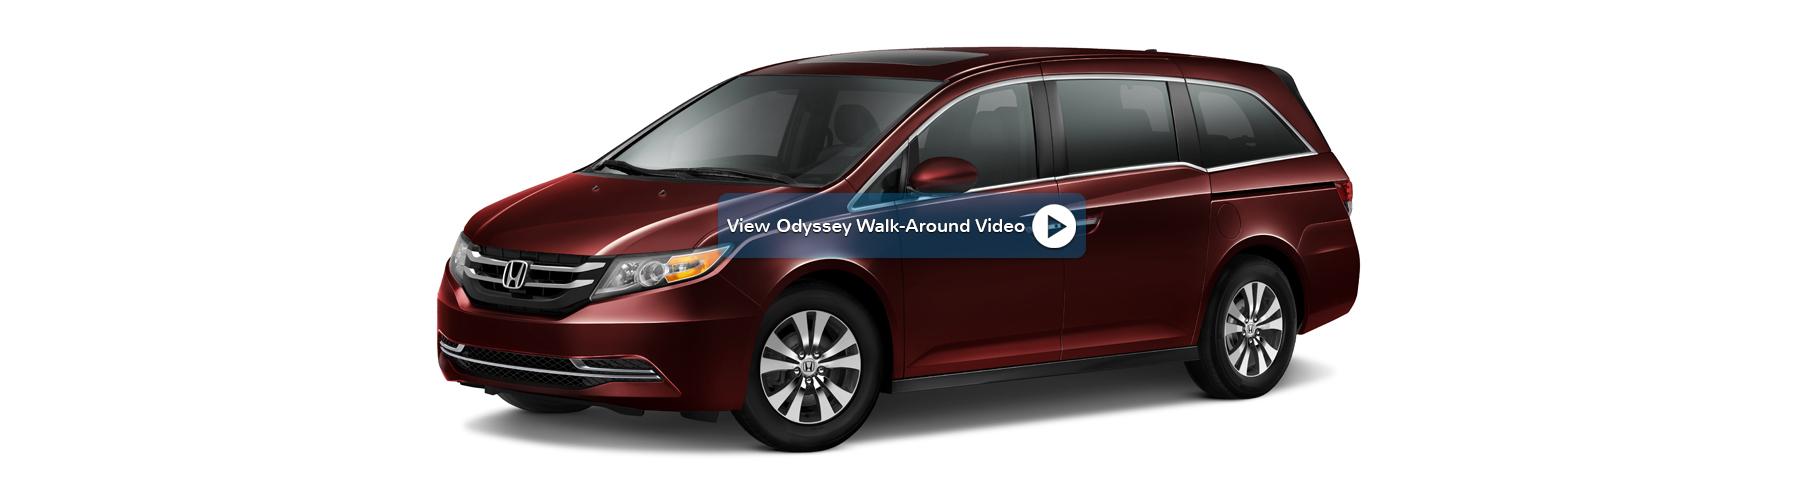 2016 Honda Odyssey New England Honda Dealers